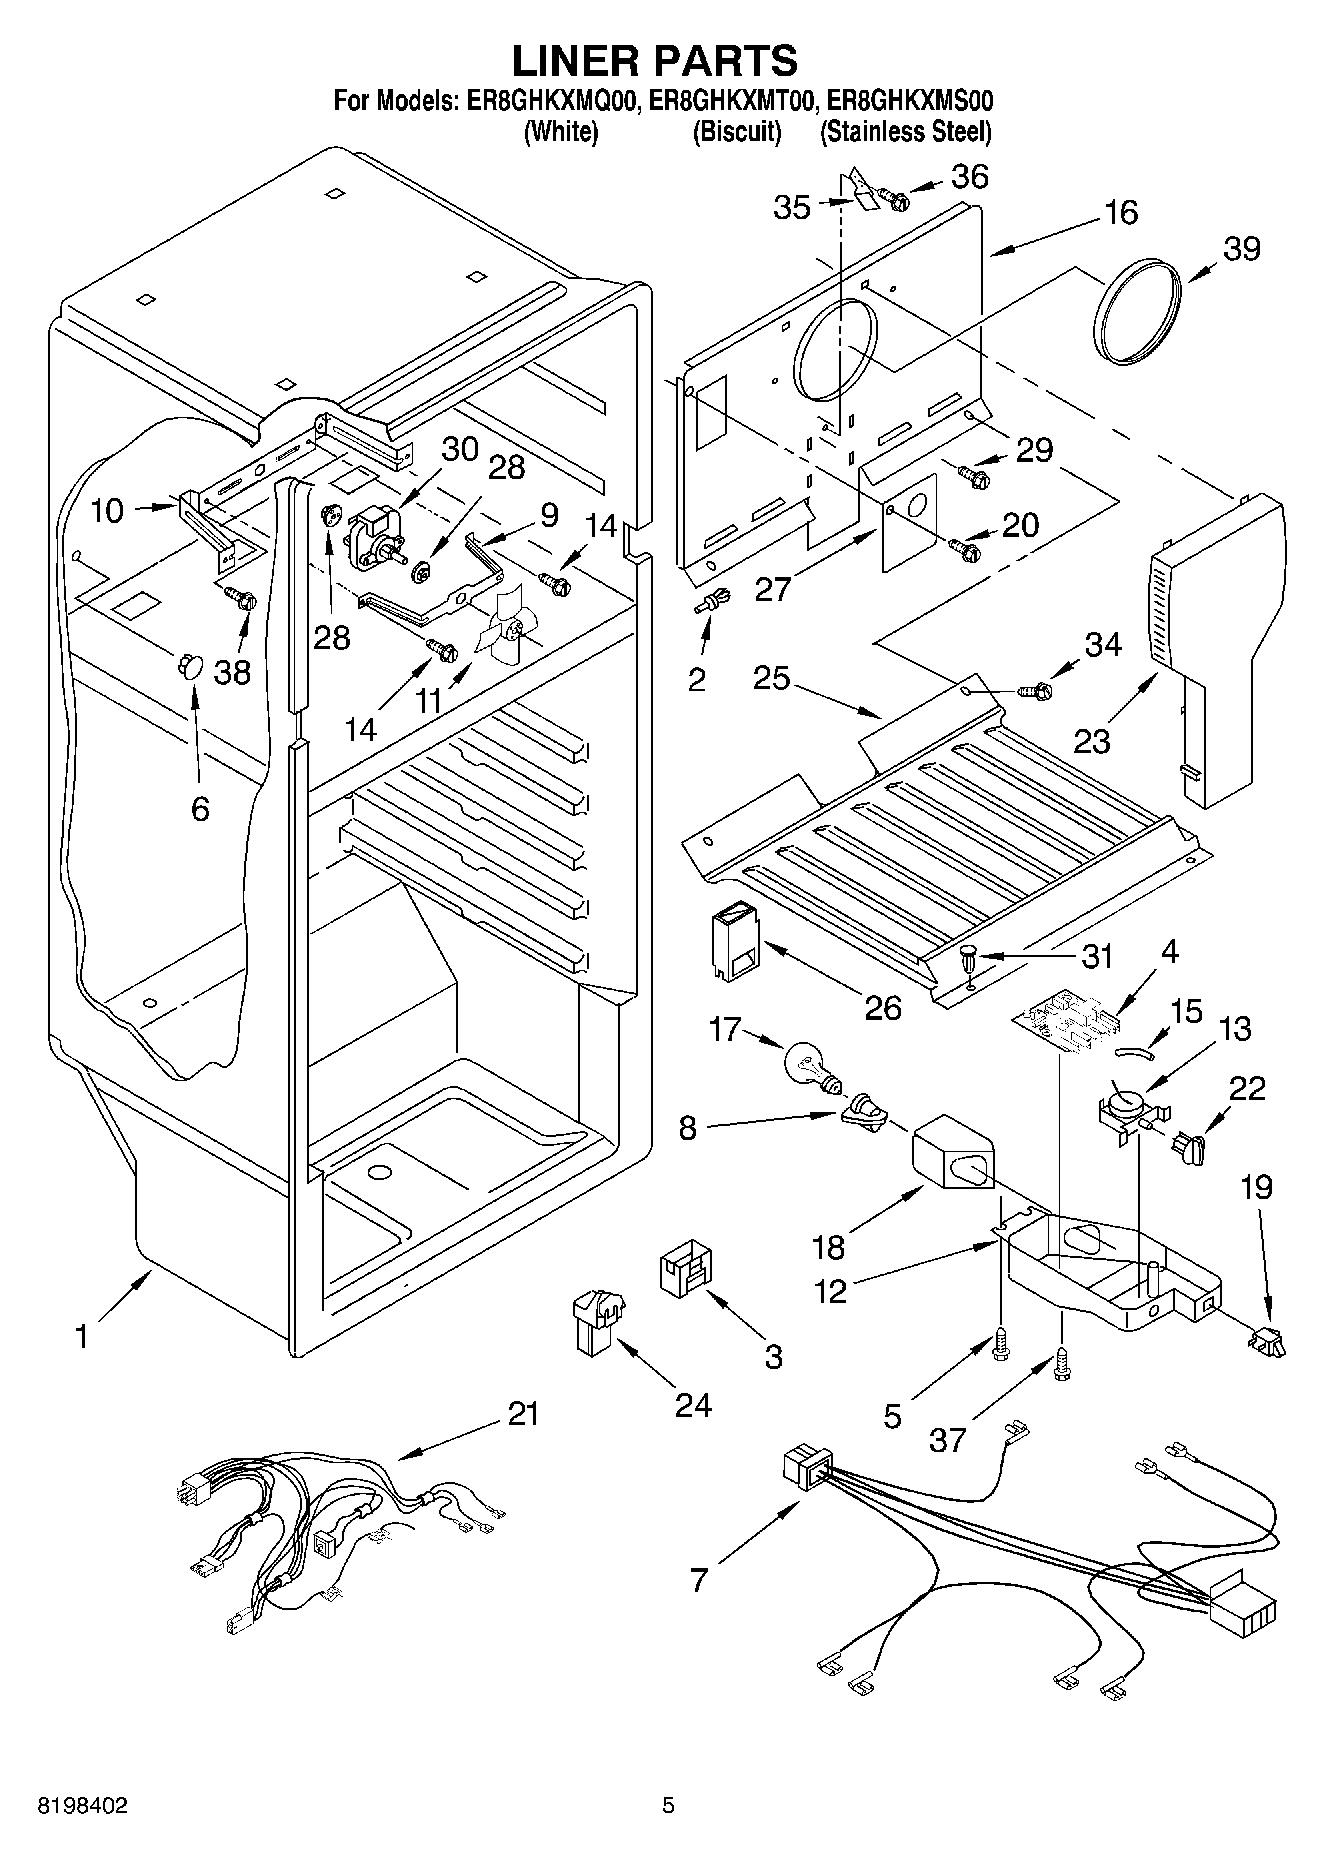 ER8GHKXMS00